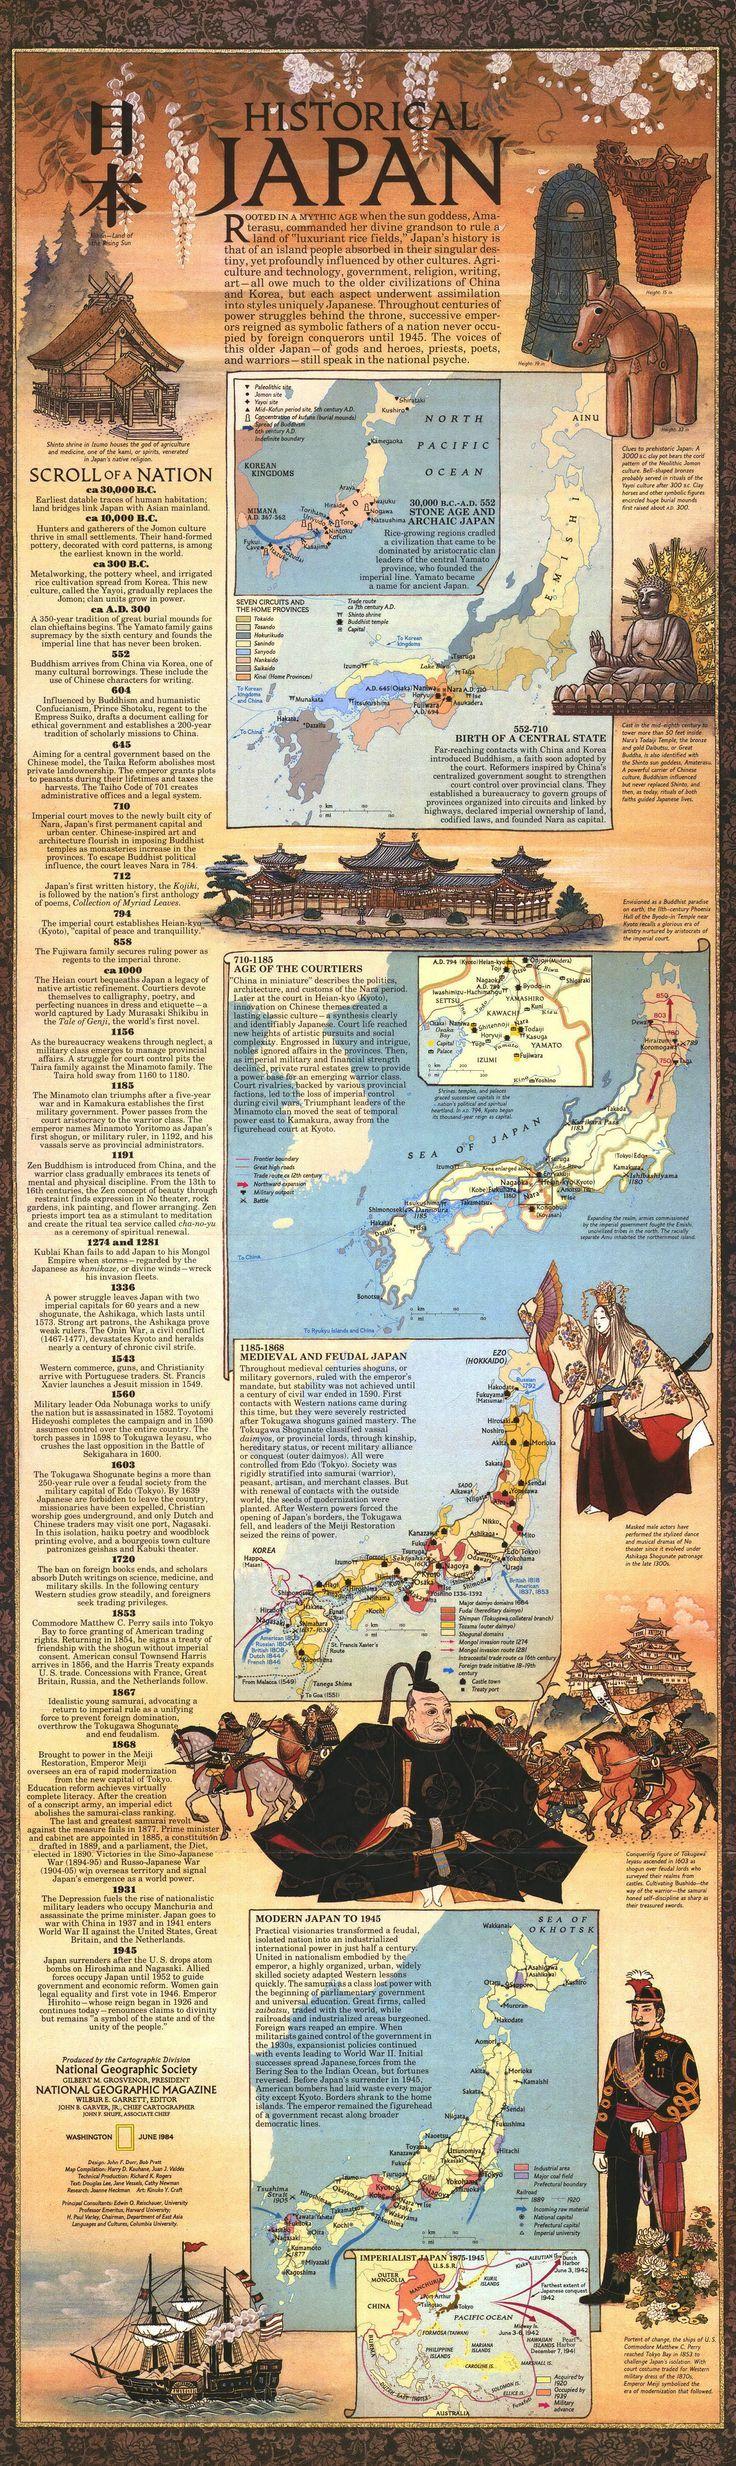 67bf243940bf911dfa459a9a01d5cc28 Jpg 736 2466 Japanese History Historical Japan Historical Timeline